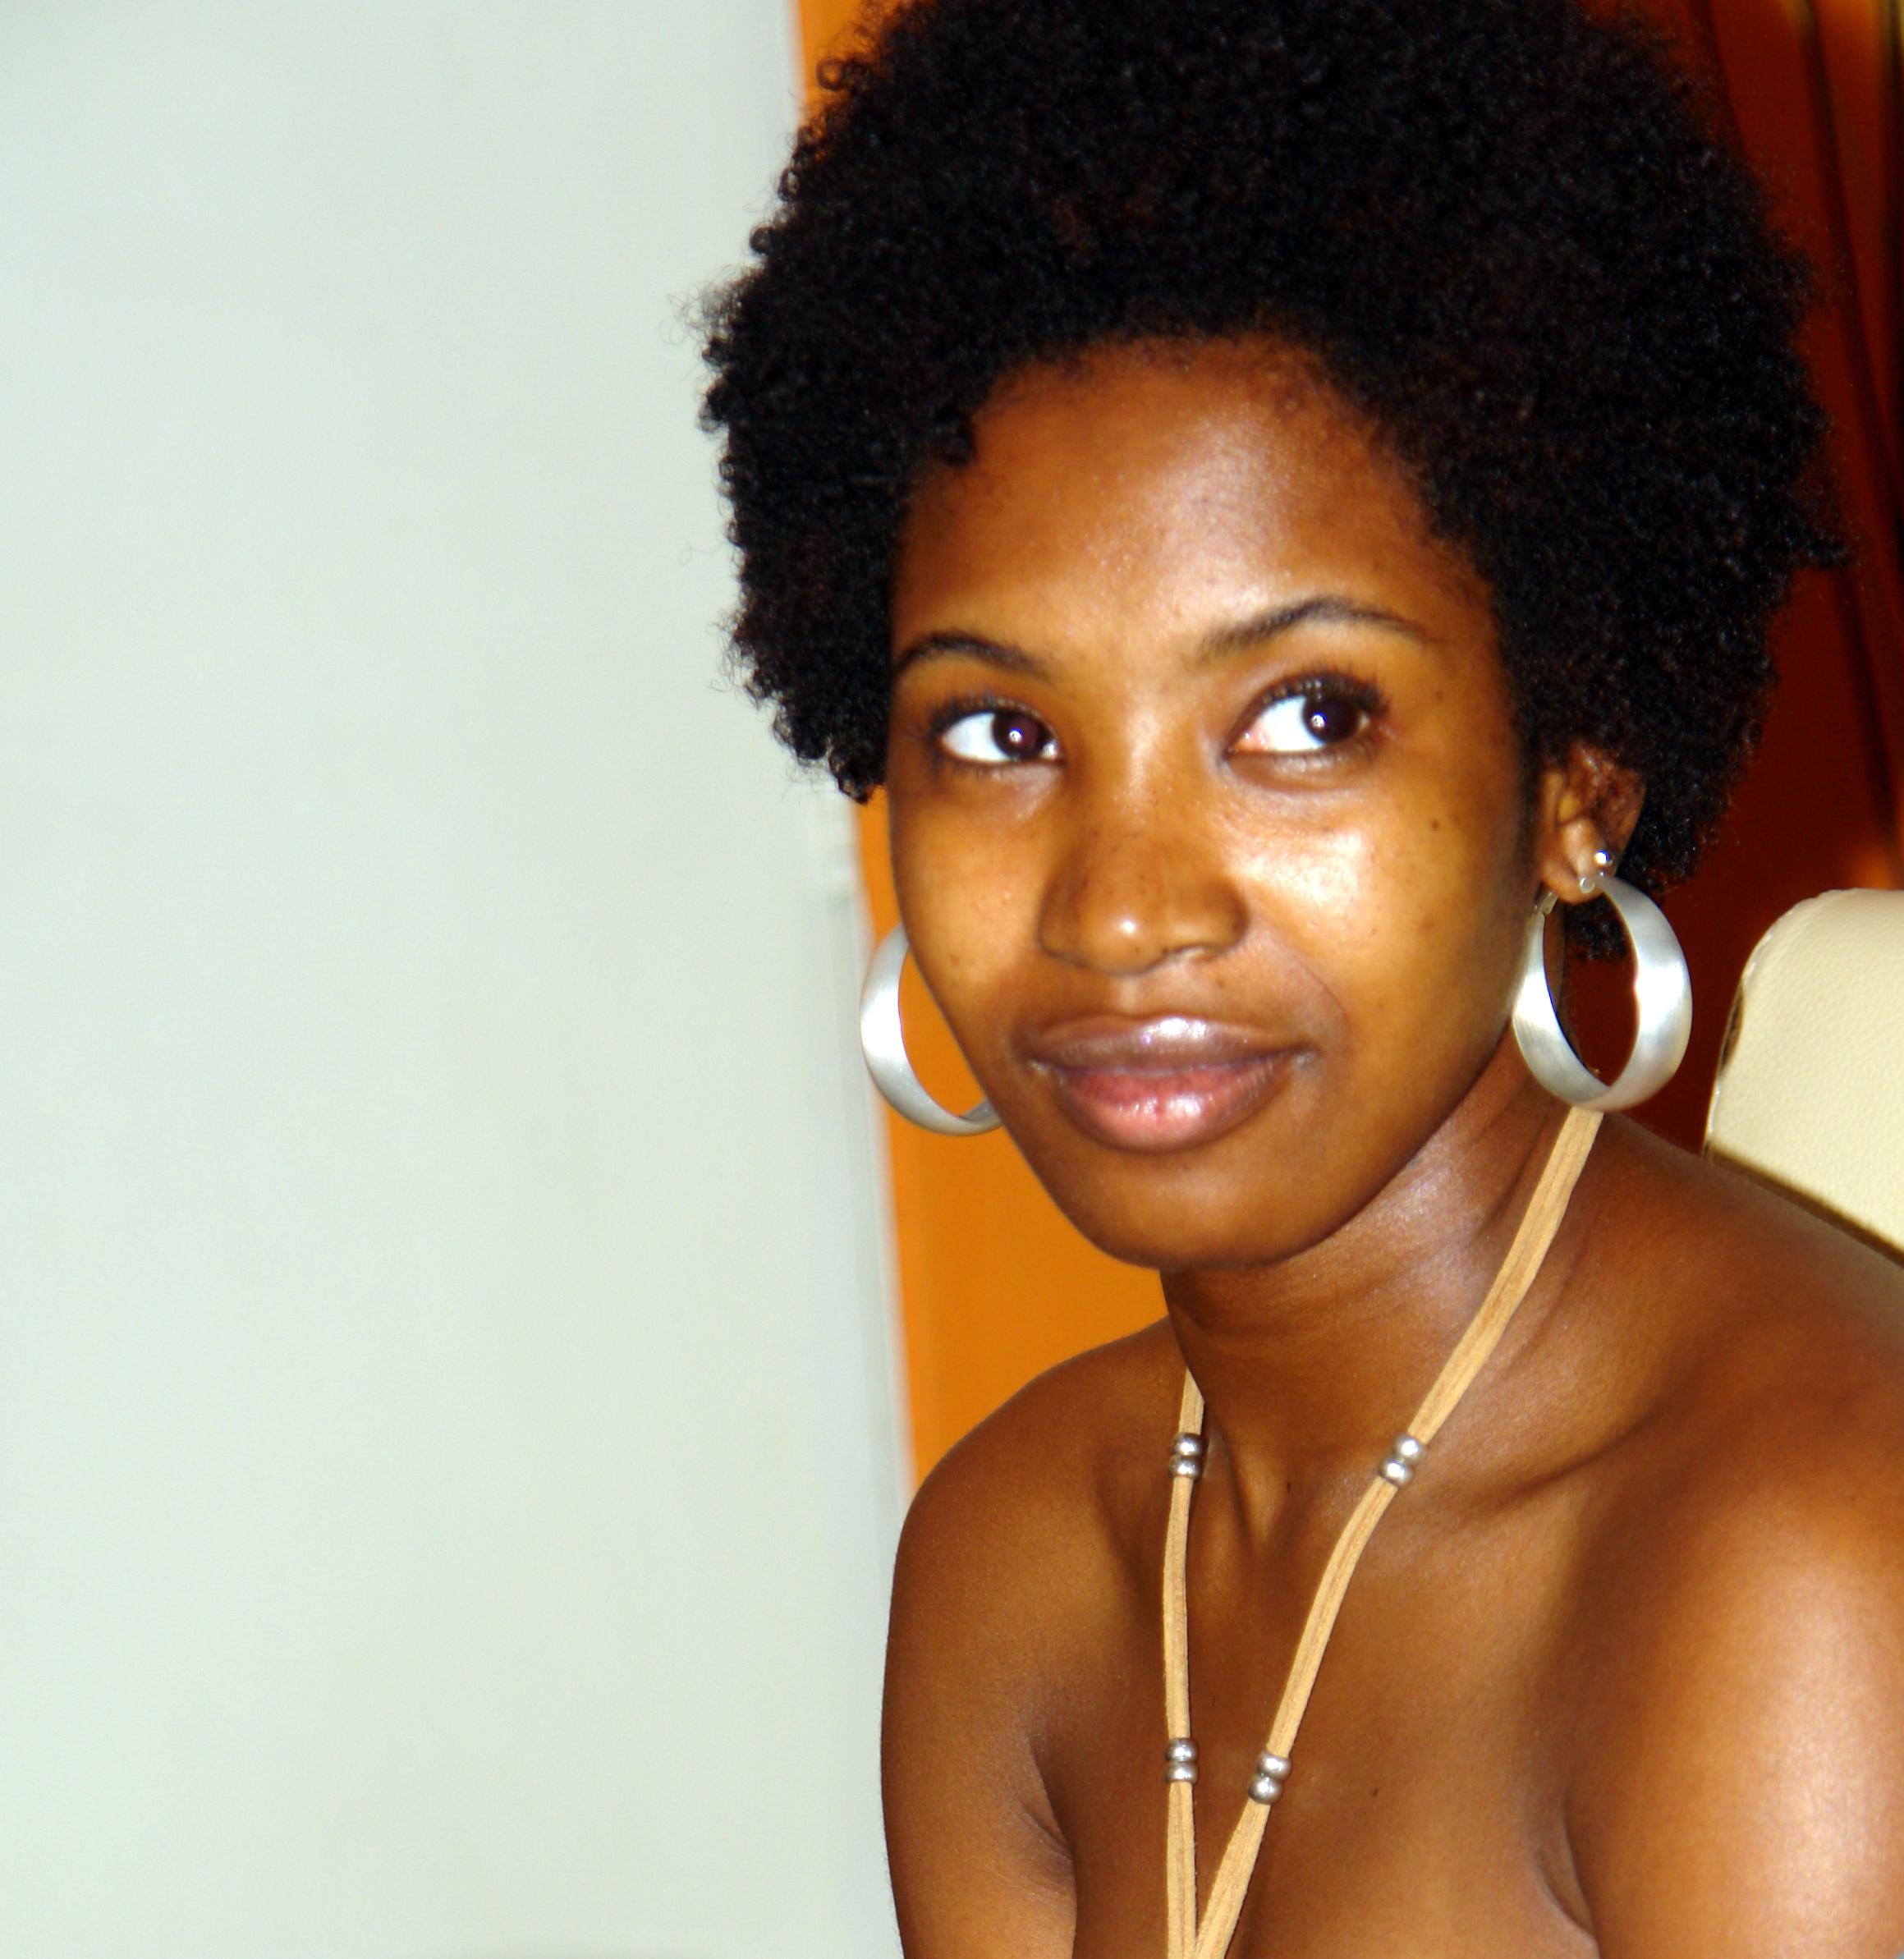 Beautiful and Handsome Bantu People Photos Here! - Romance